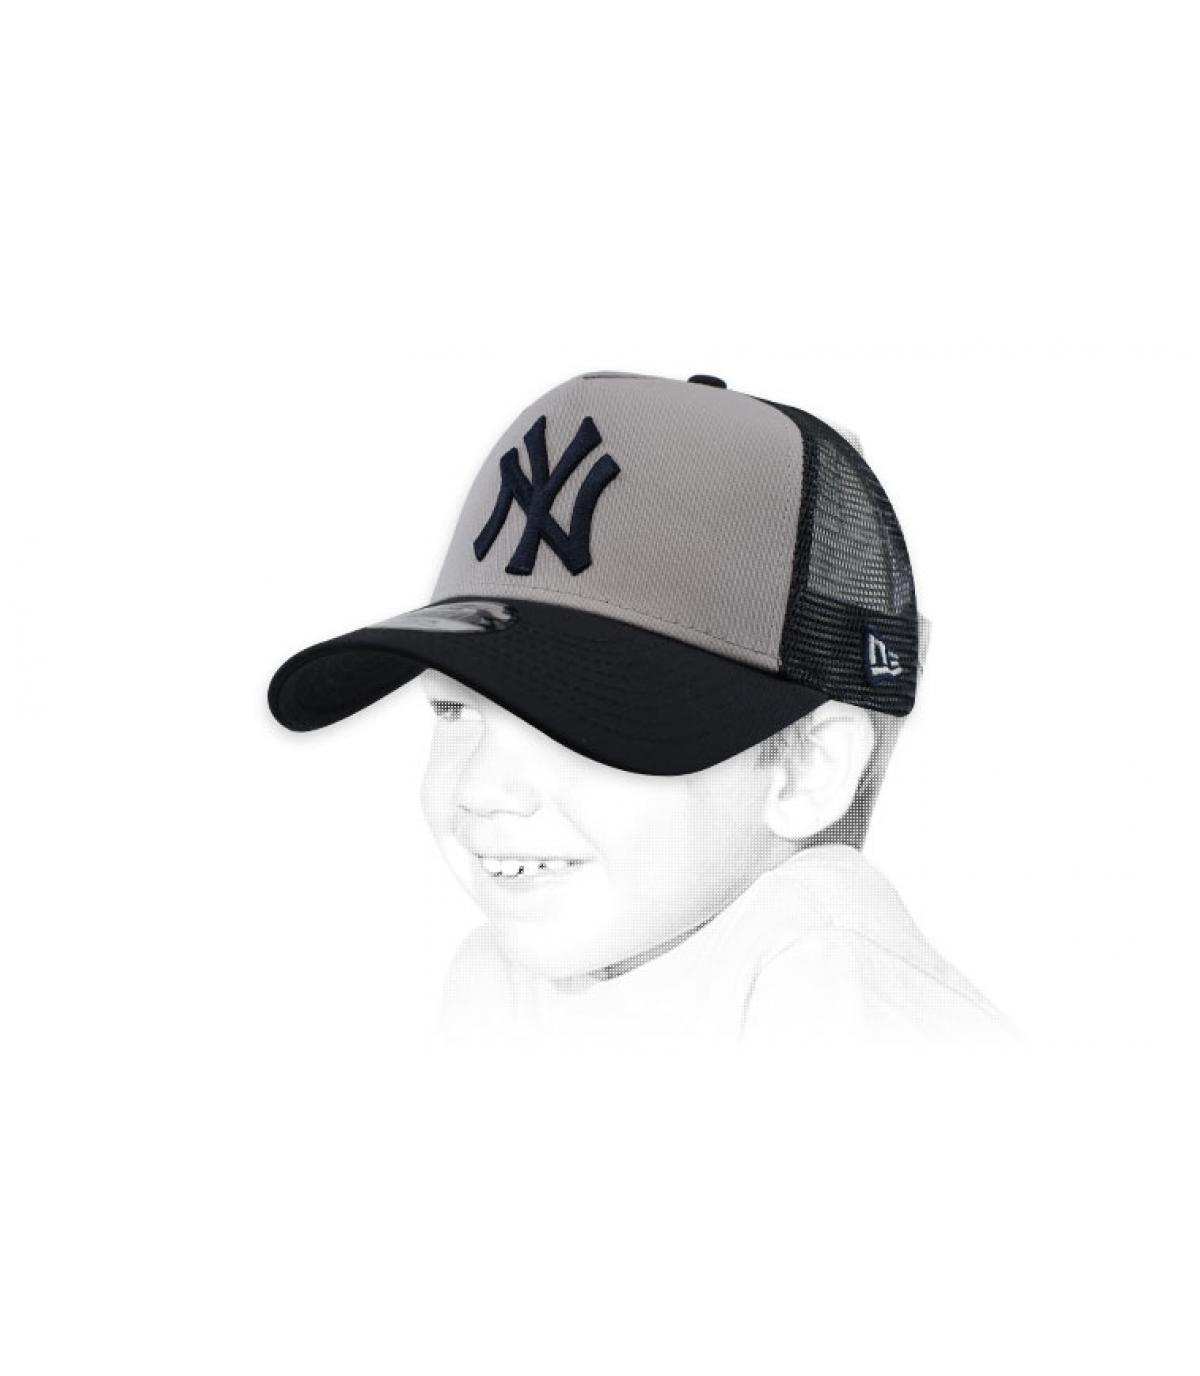 Kinder Trucker NY grau weiß